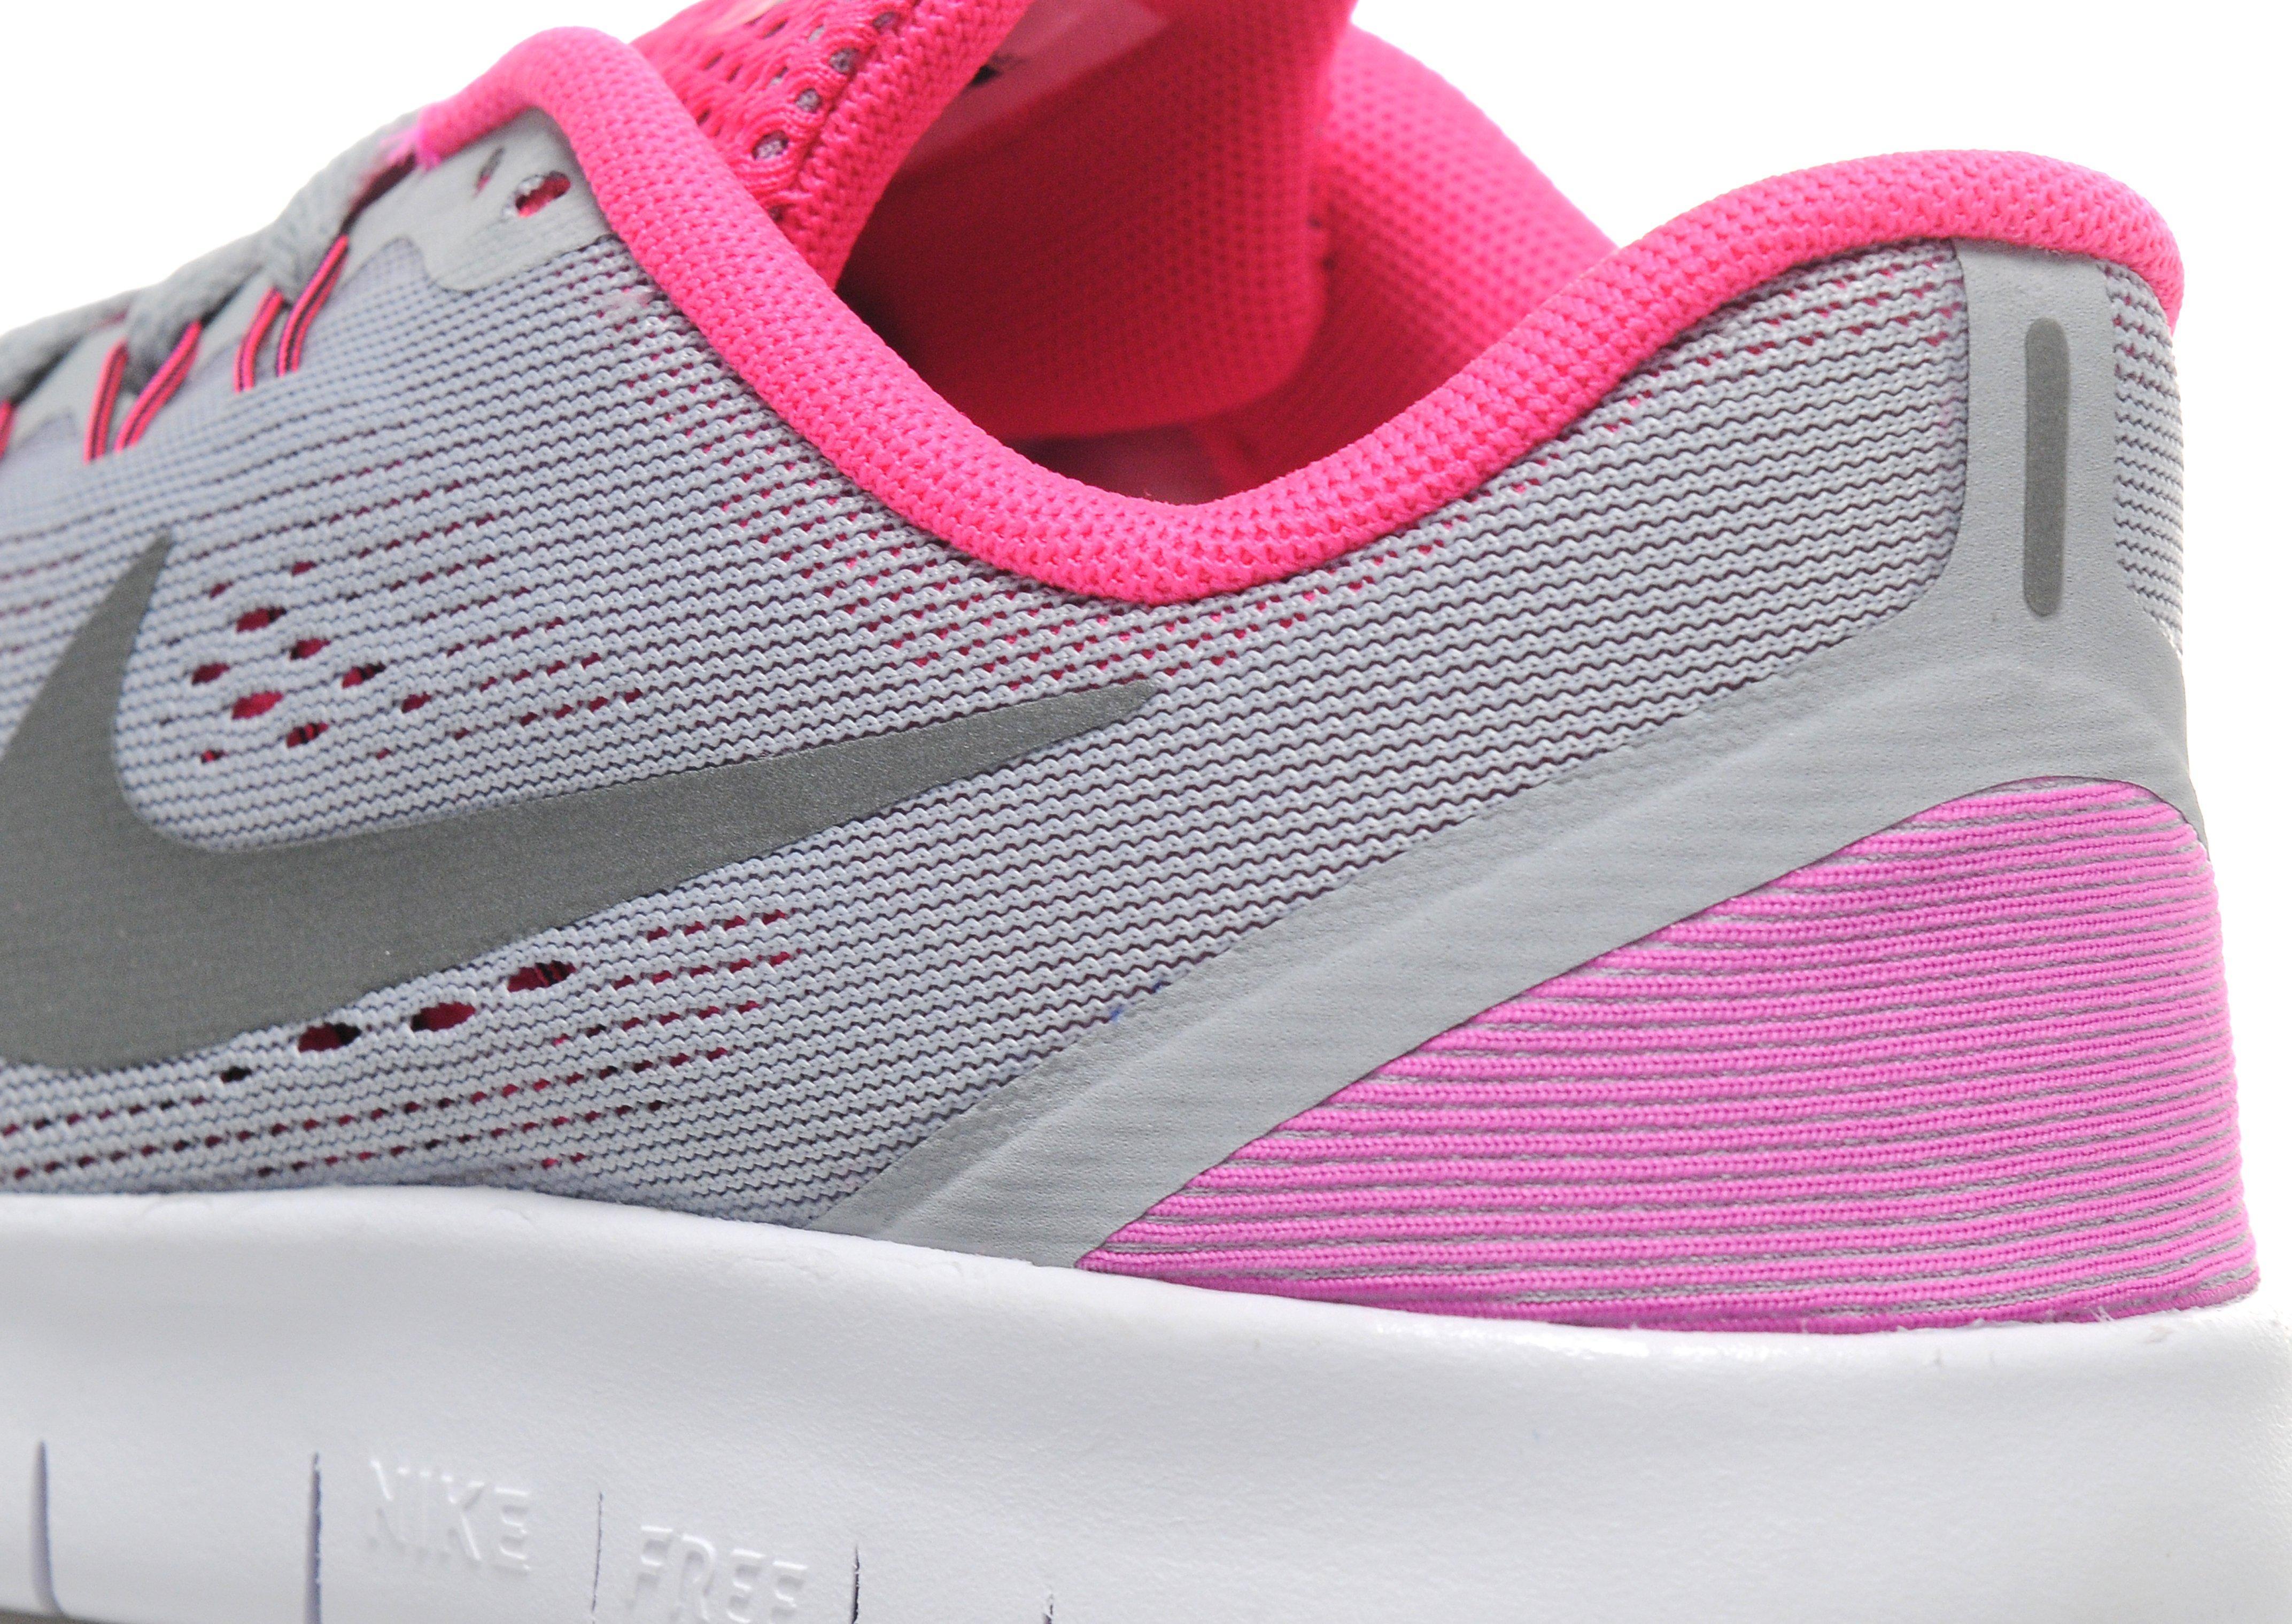 Nike Free Run 2 Junior Équipement Jd